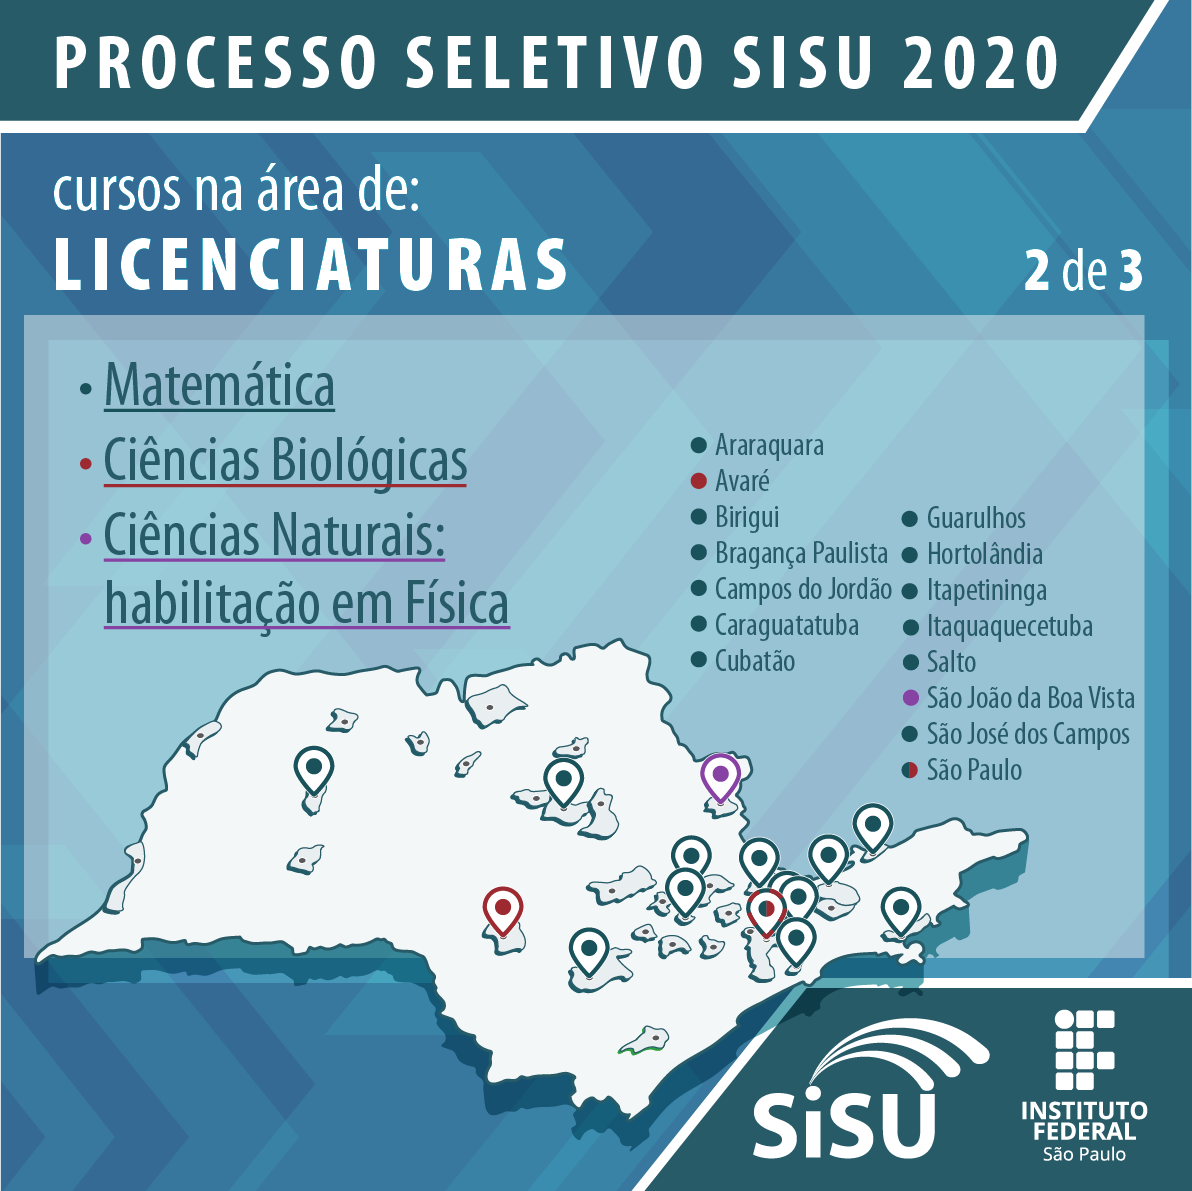 Processo seletivo SISU 2020